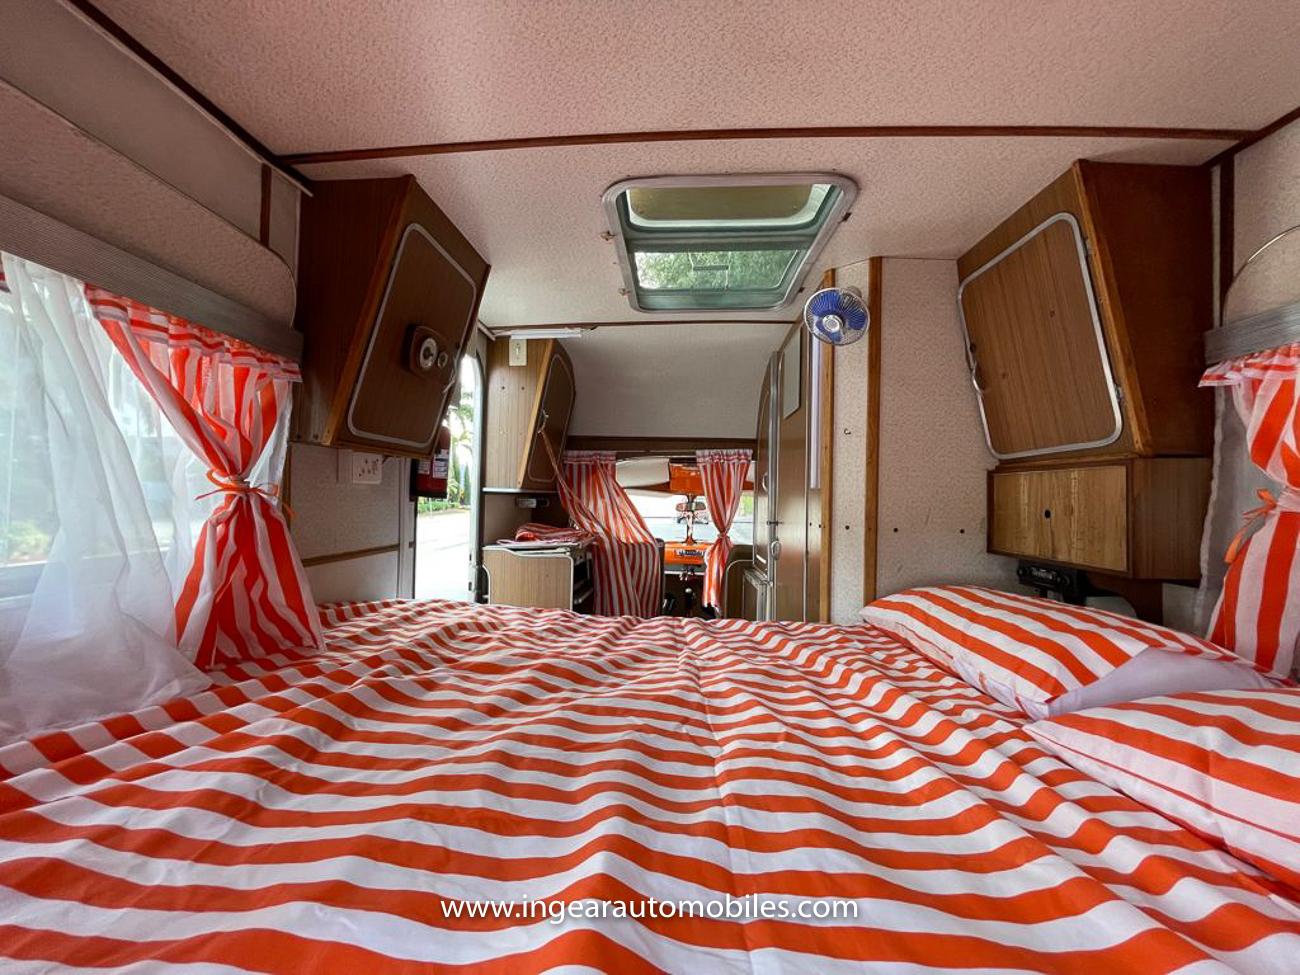 Volkswagen Bus Camper VW interior bedding